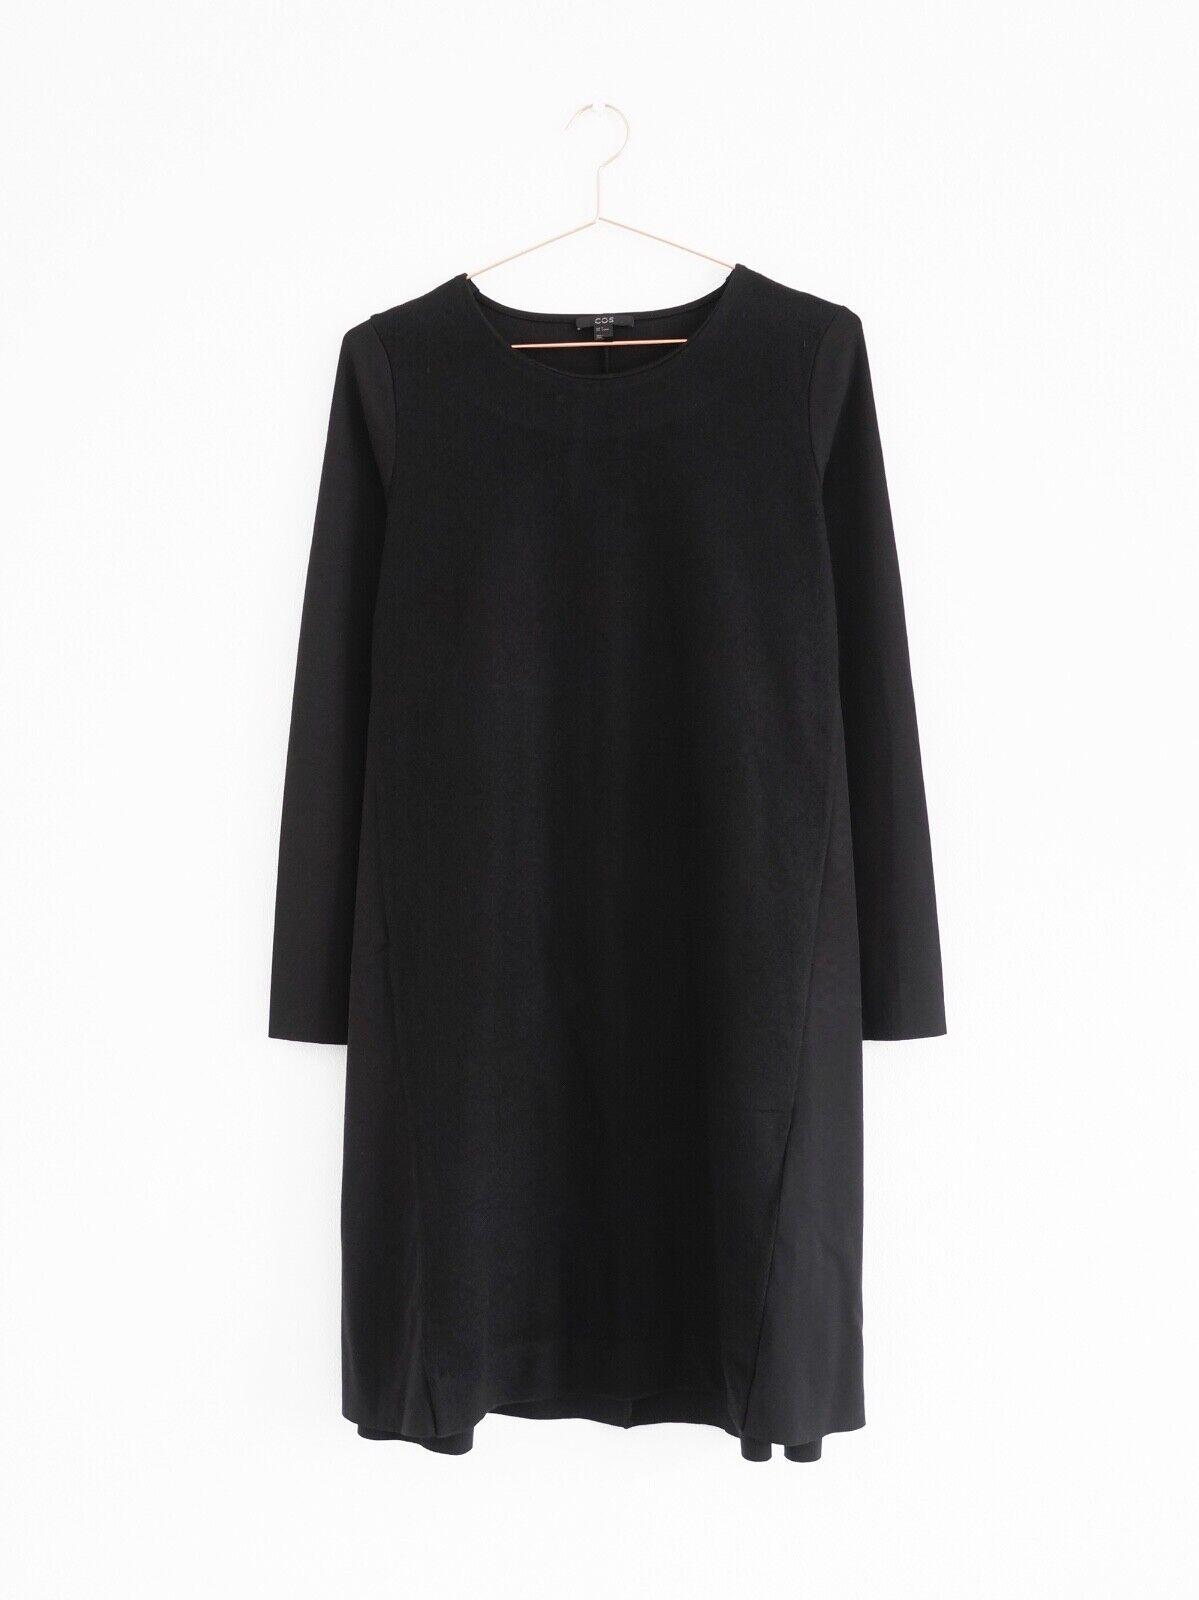 HOF115: COS Kleid A-Linie wolle schwarz / Wool front A-line dress black M